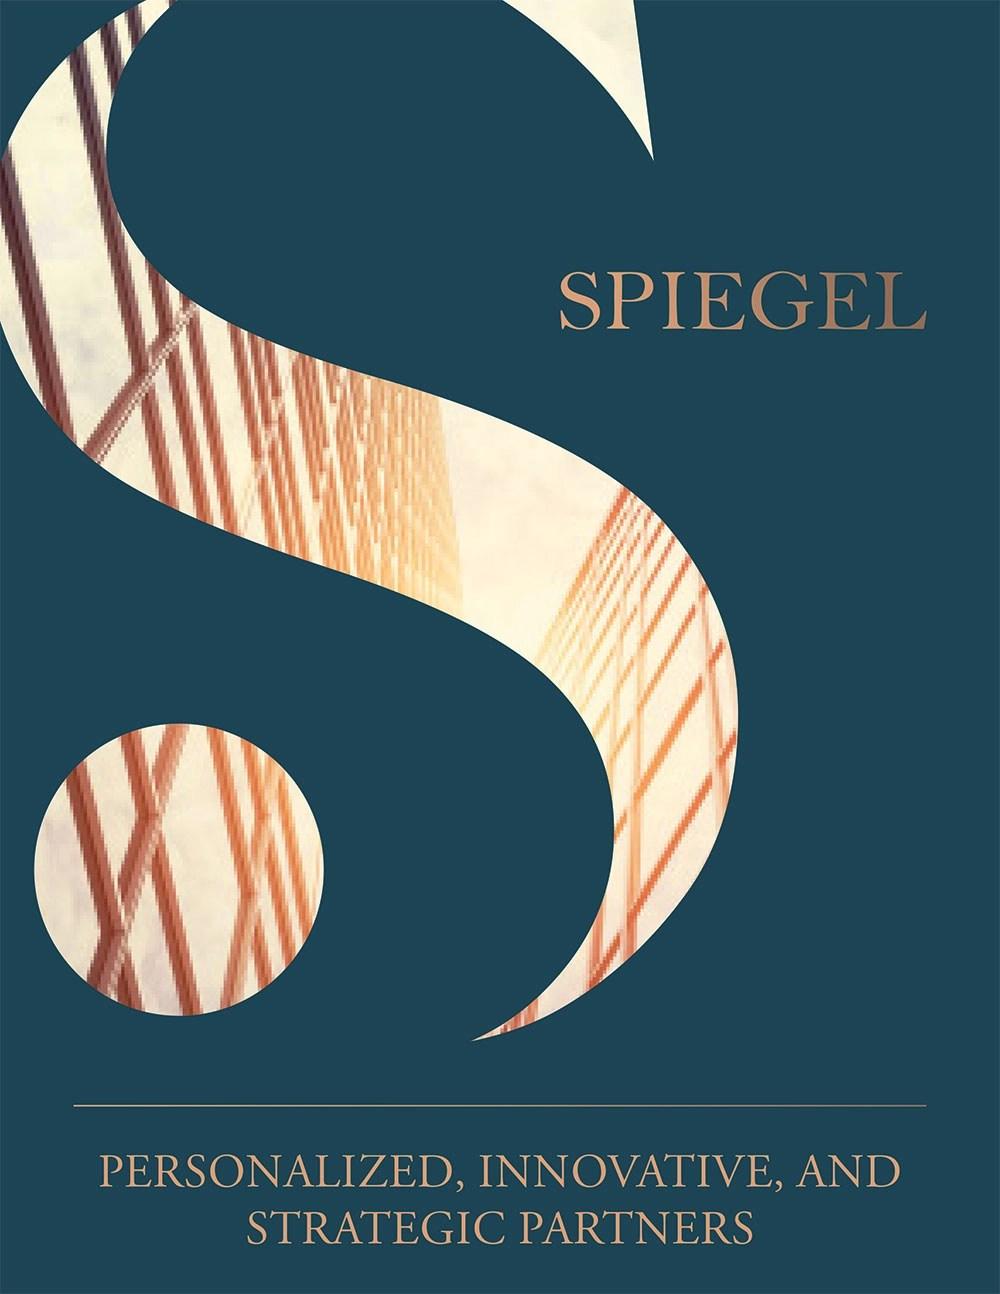 Spiegel-Corporate-Brochure-Cover